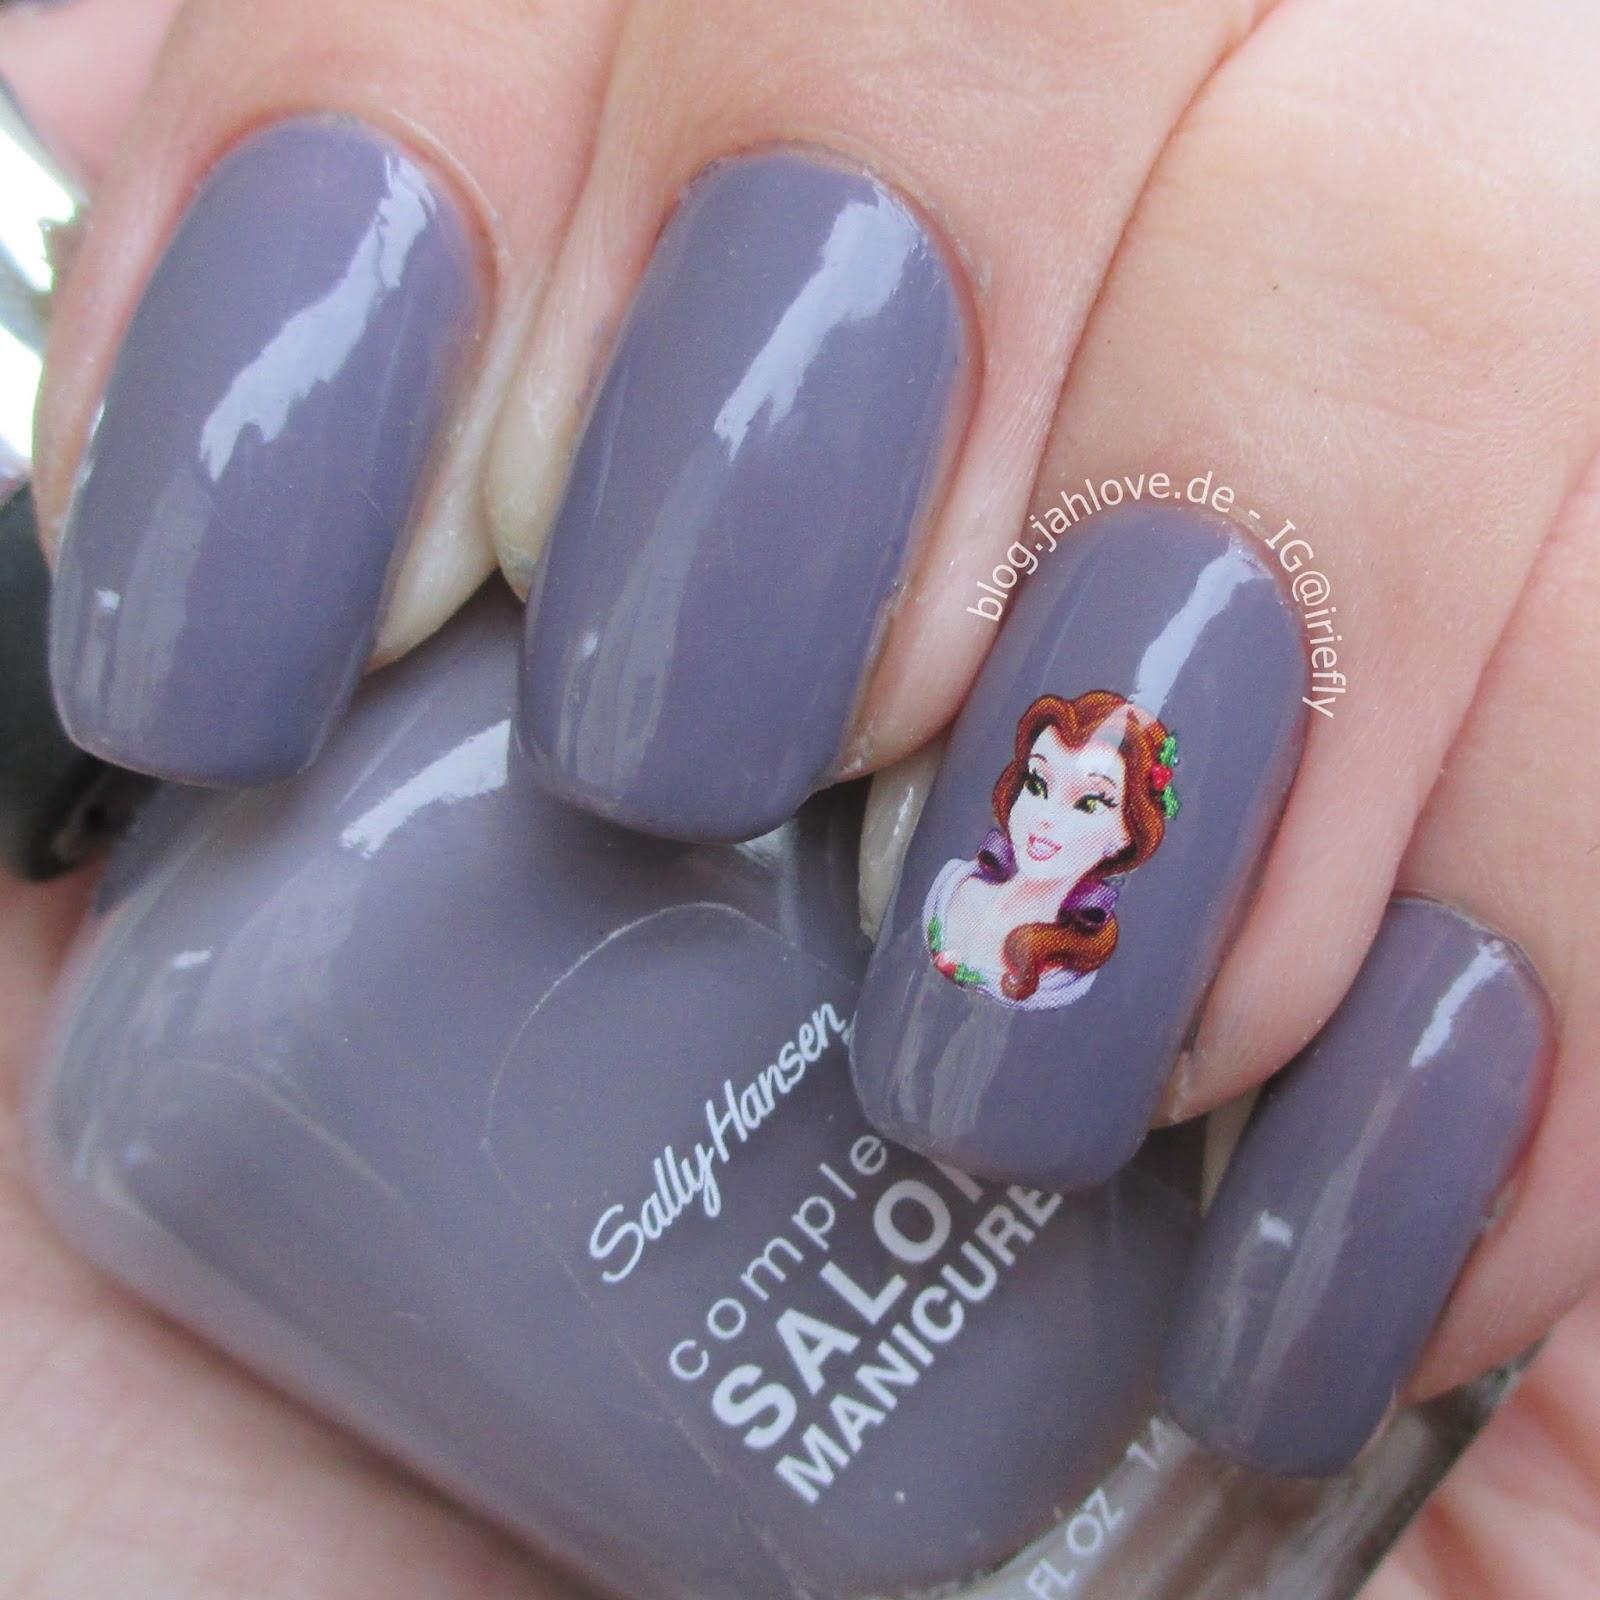 blog.jahlove.de ::.: [Nails] Sally Hansen \